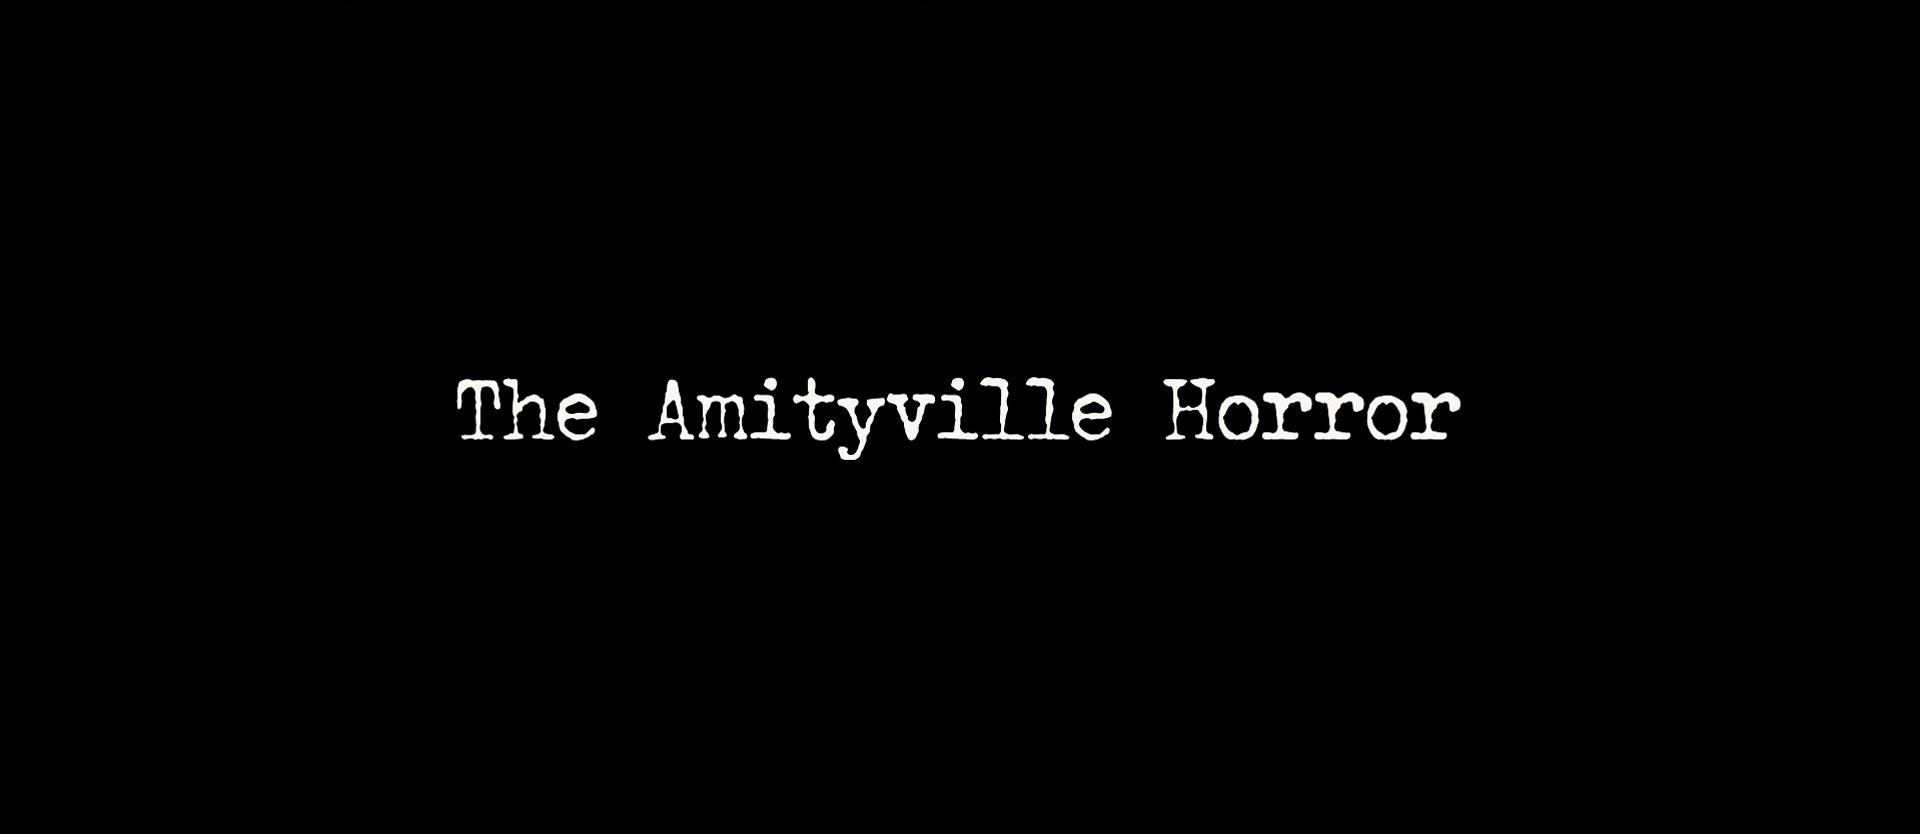 AMITYVILLE (The Amityville Horror) de Andrew Douglas (2005)